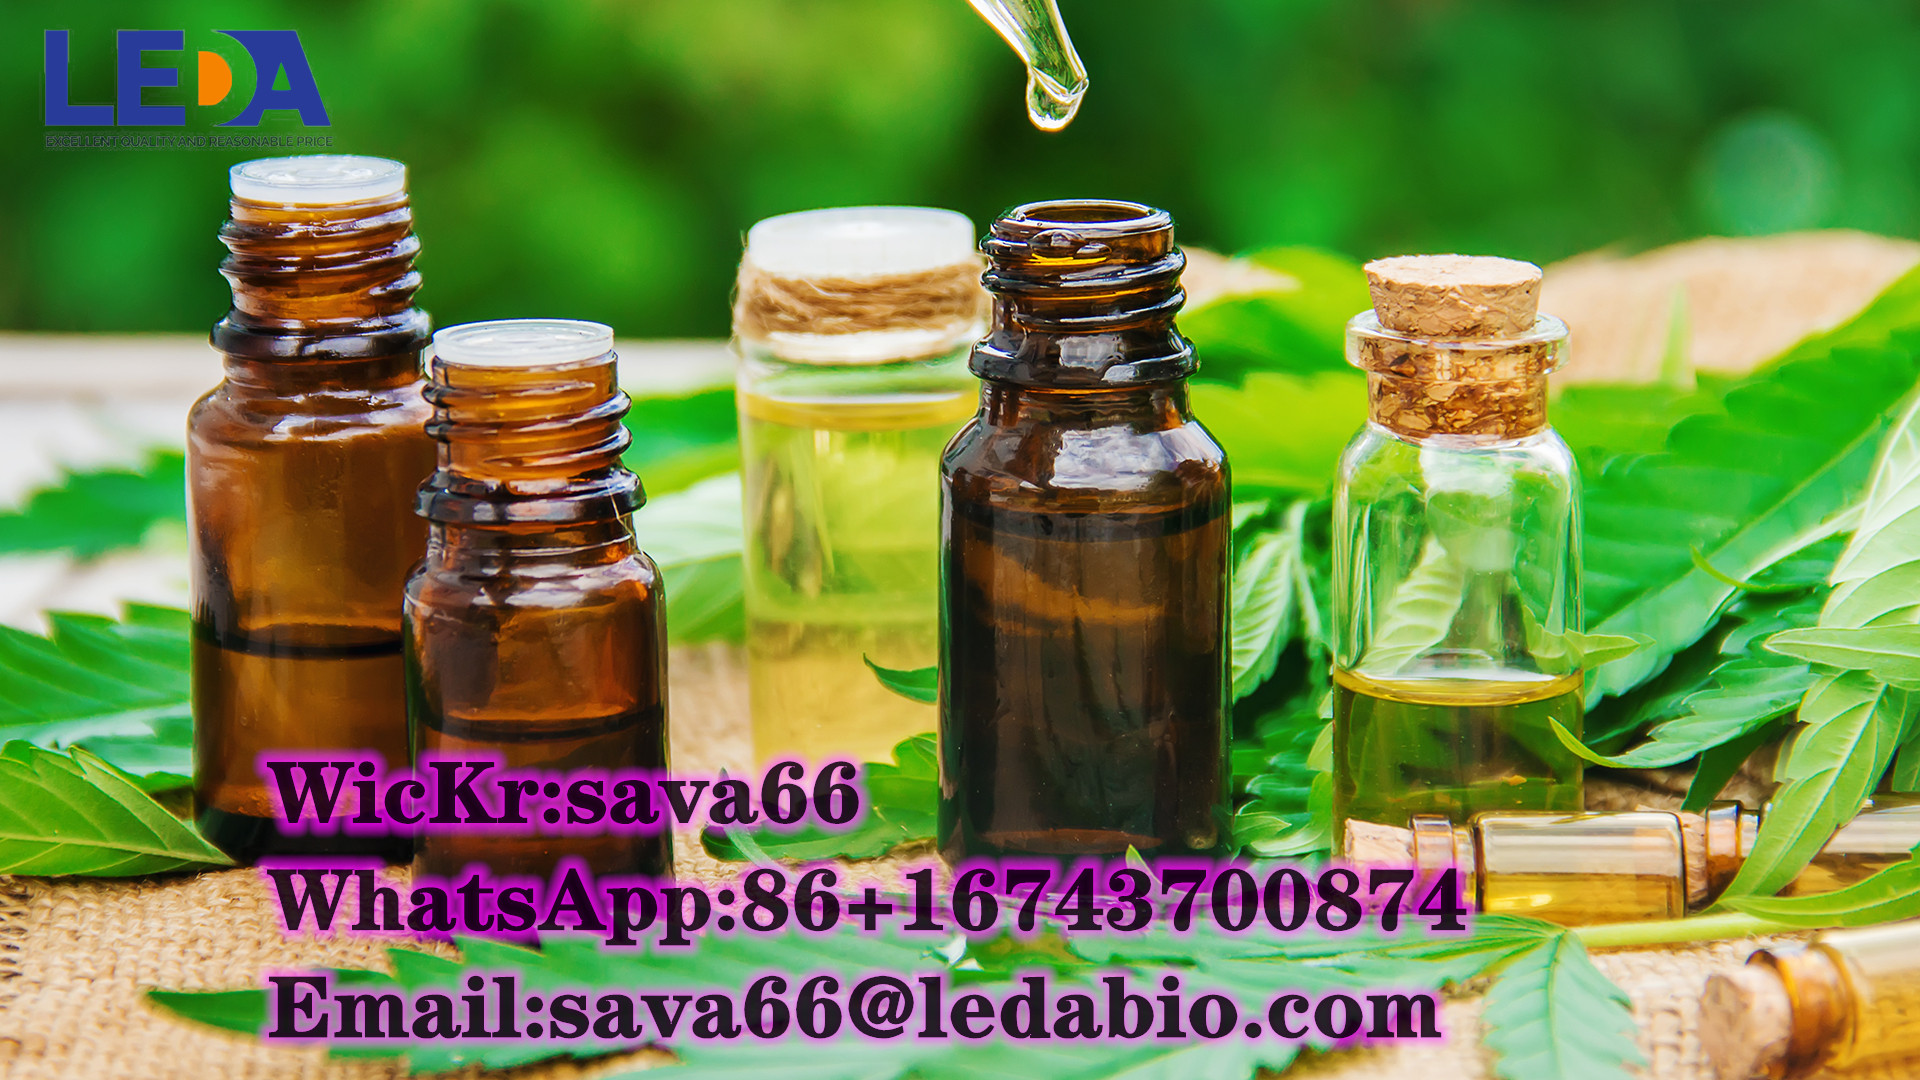 Full Spectrum CBD Distillate (Oil) 300mg cbd powder for sale(WicKr:sava66 ,WhatsApp:86+16743700874